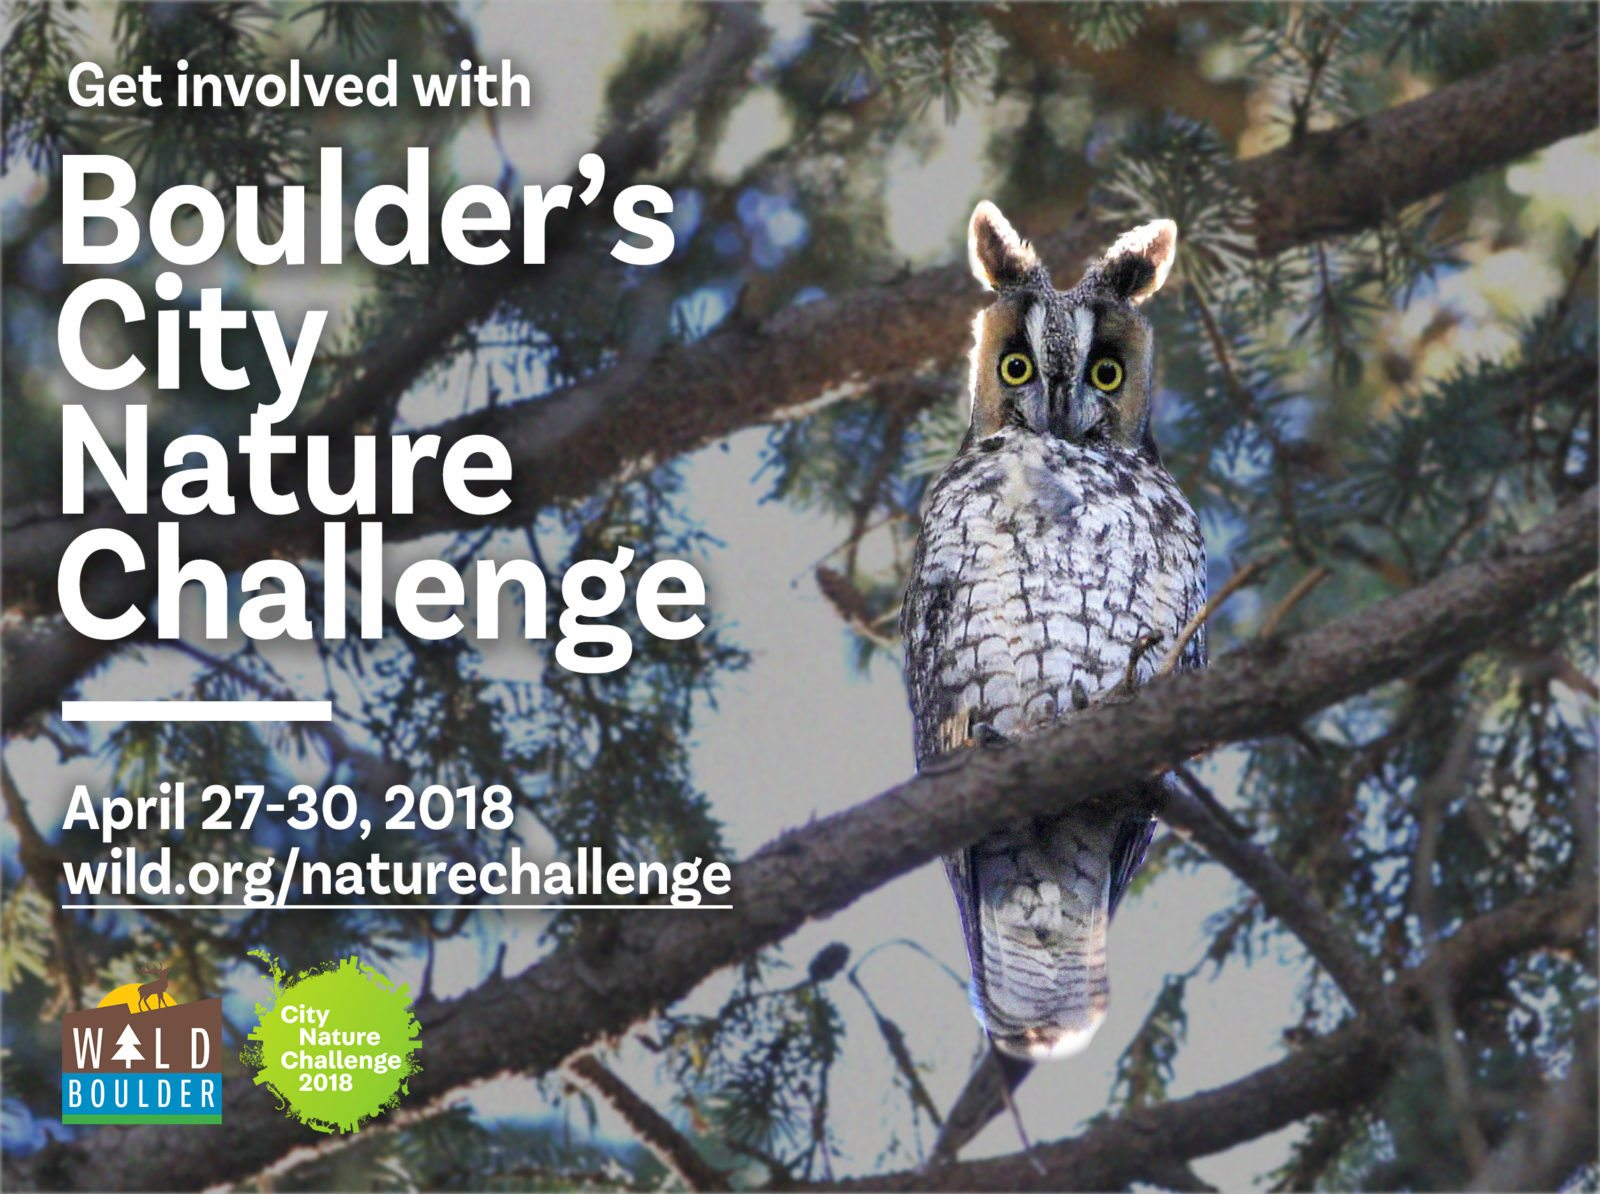 City Nature Challenge BioBlitz Citizen Science enhanced with iNaturalist